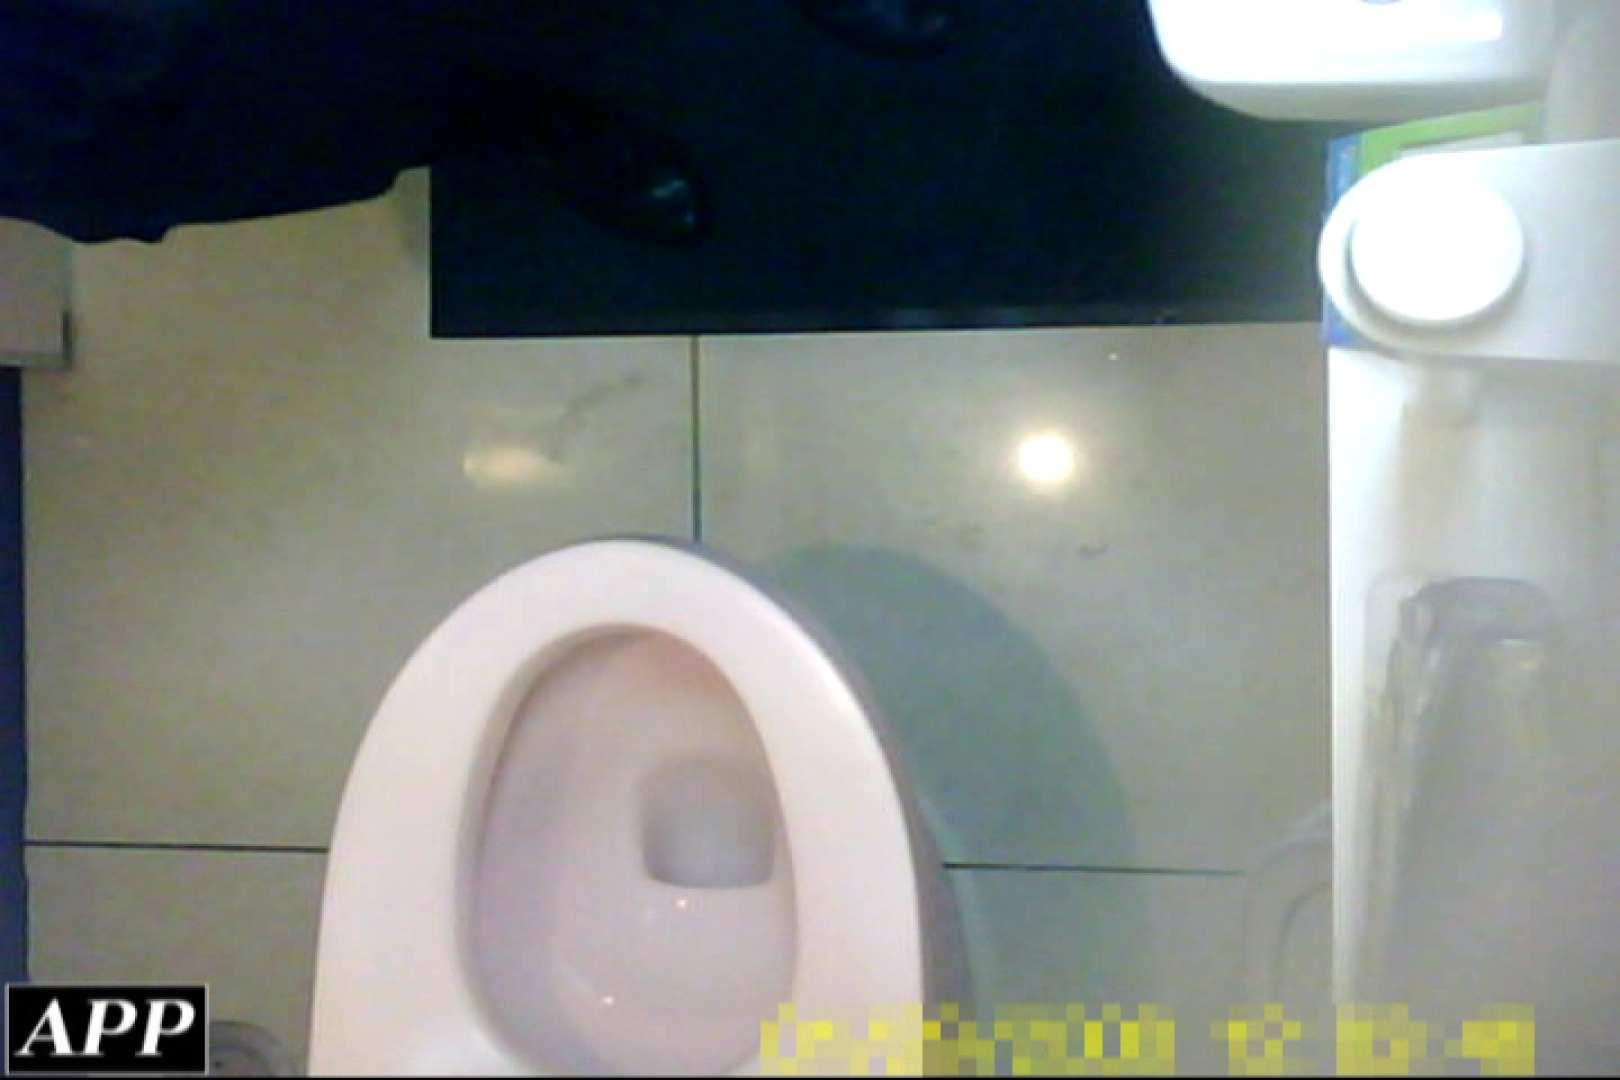 3視点洗面所 vol.110 OLハメ撮り  111Pix 79